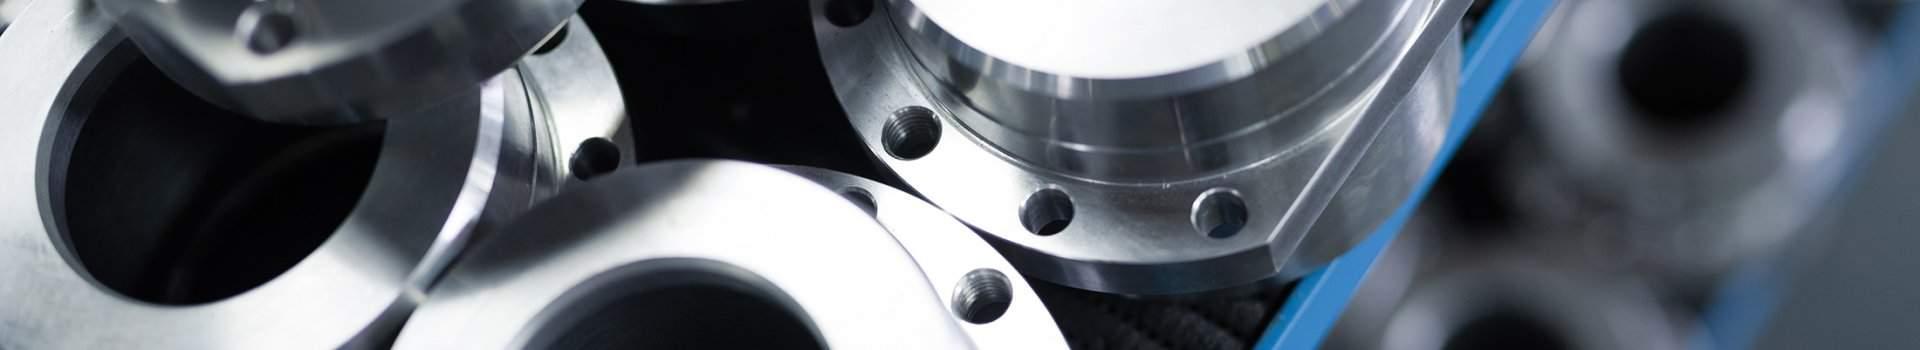 Rama rowerowa - aluminium czy karbon?